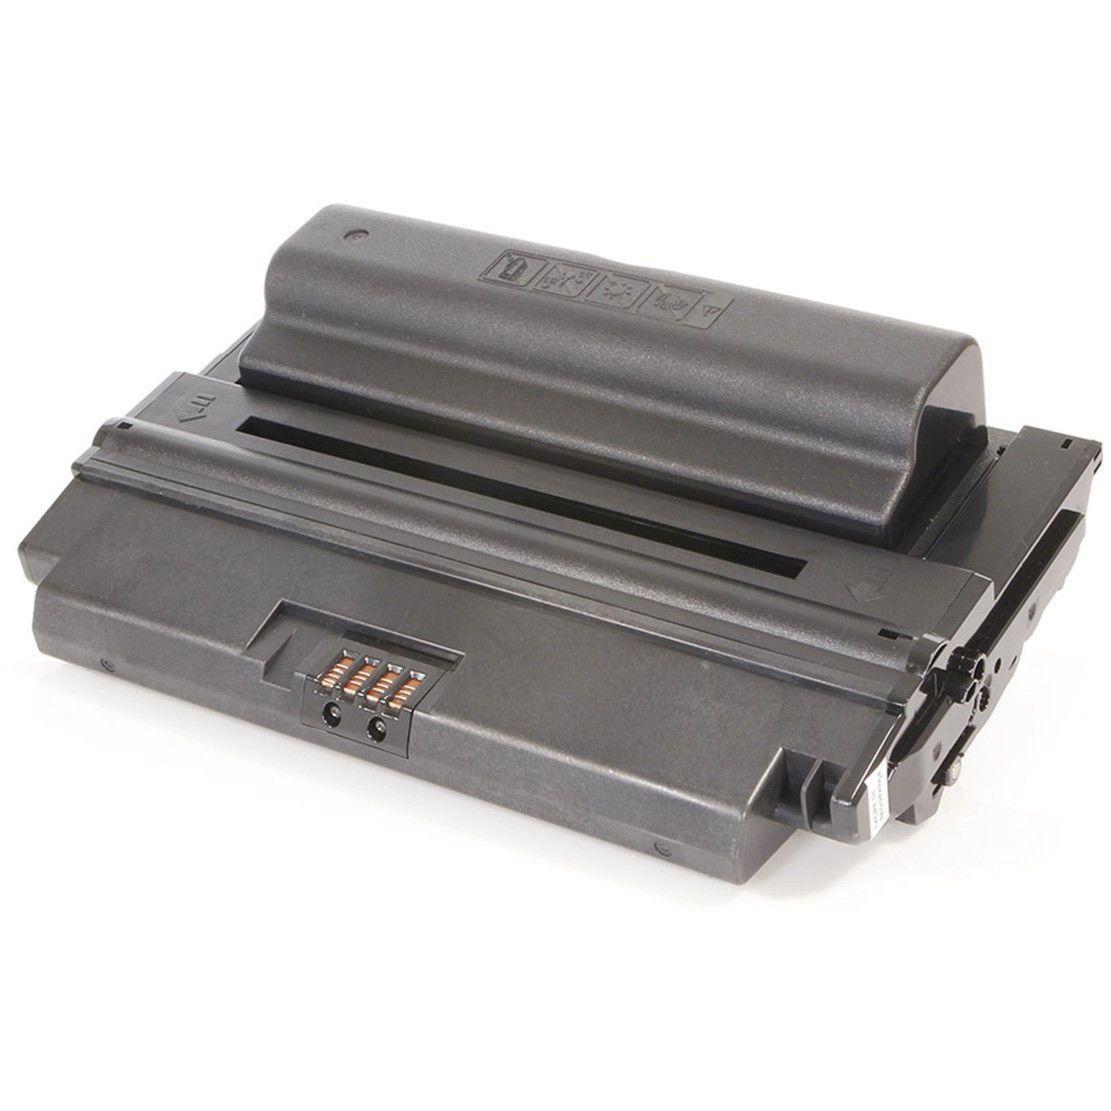 Compatível: Toner 106R01245 106R01246 para Impressora Xerox Phaser 3428 3428d 3428dn / Preto / 8.000